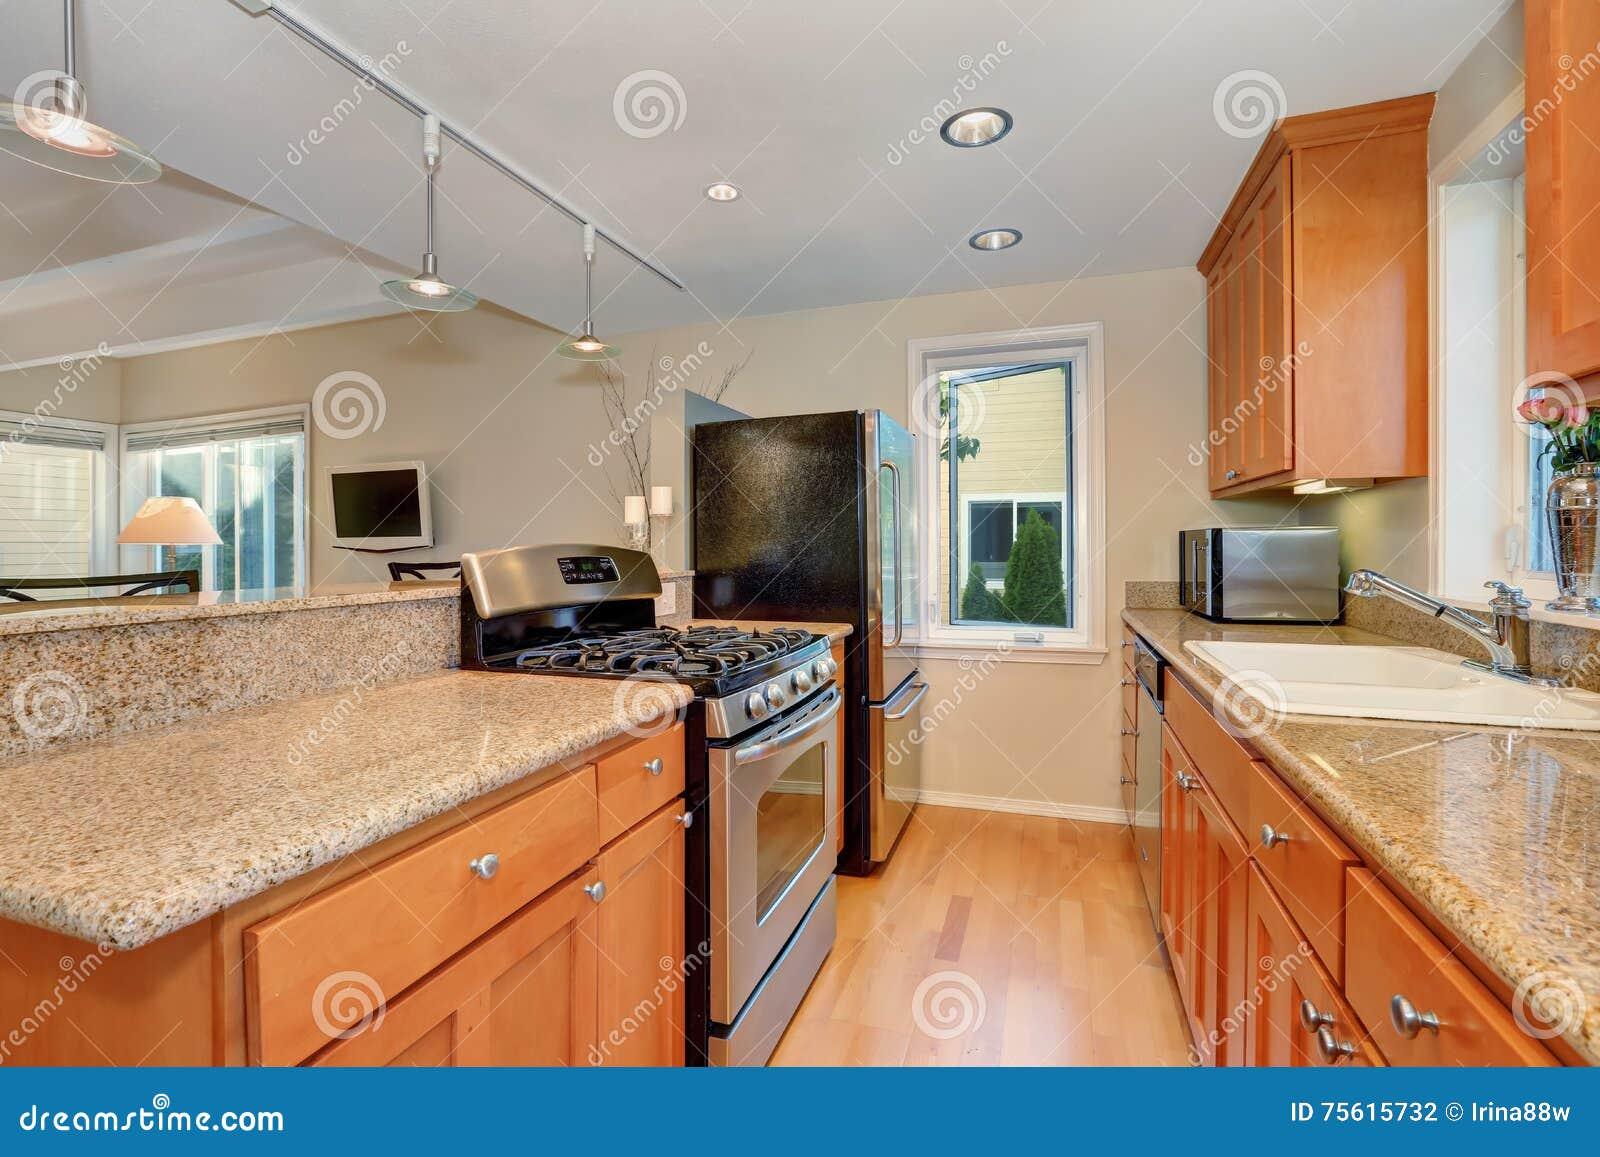 Modern Kitchen Interior With Granite Counter Tops Stock Photo